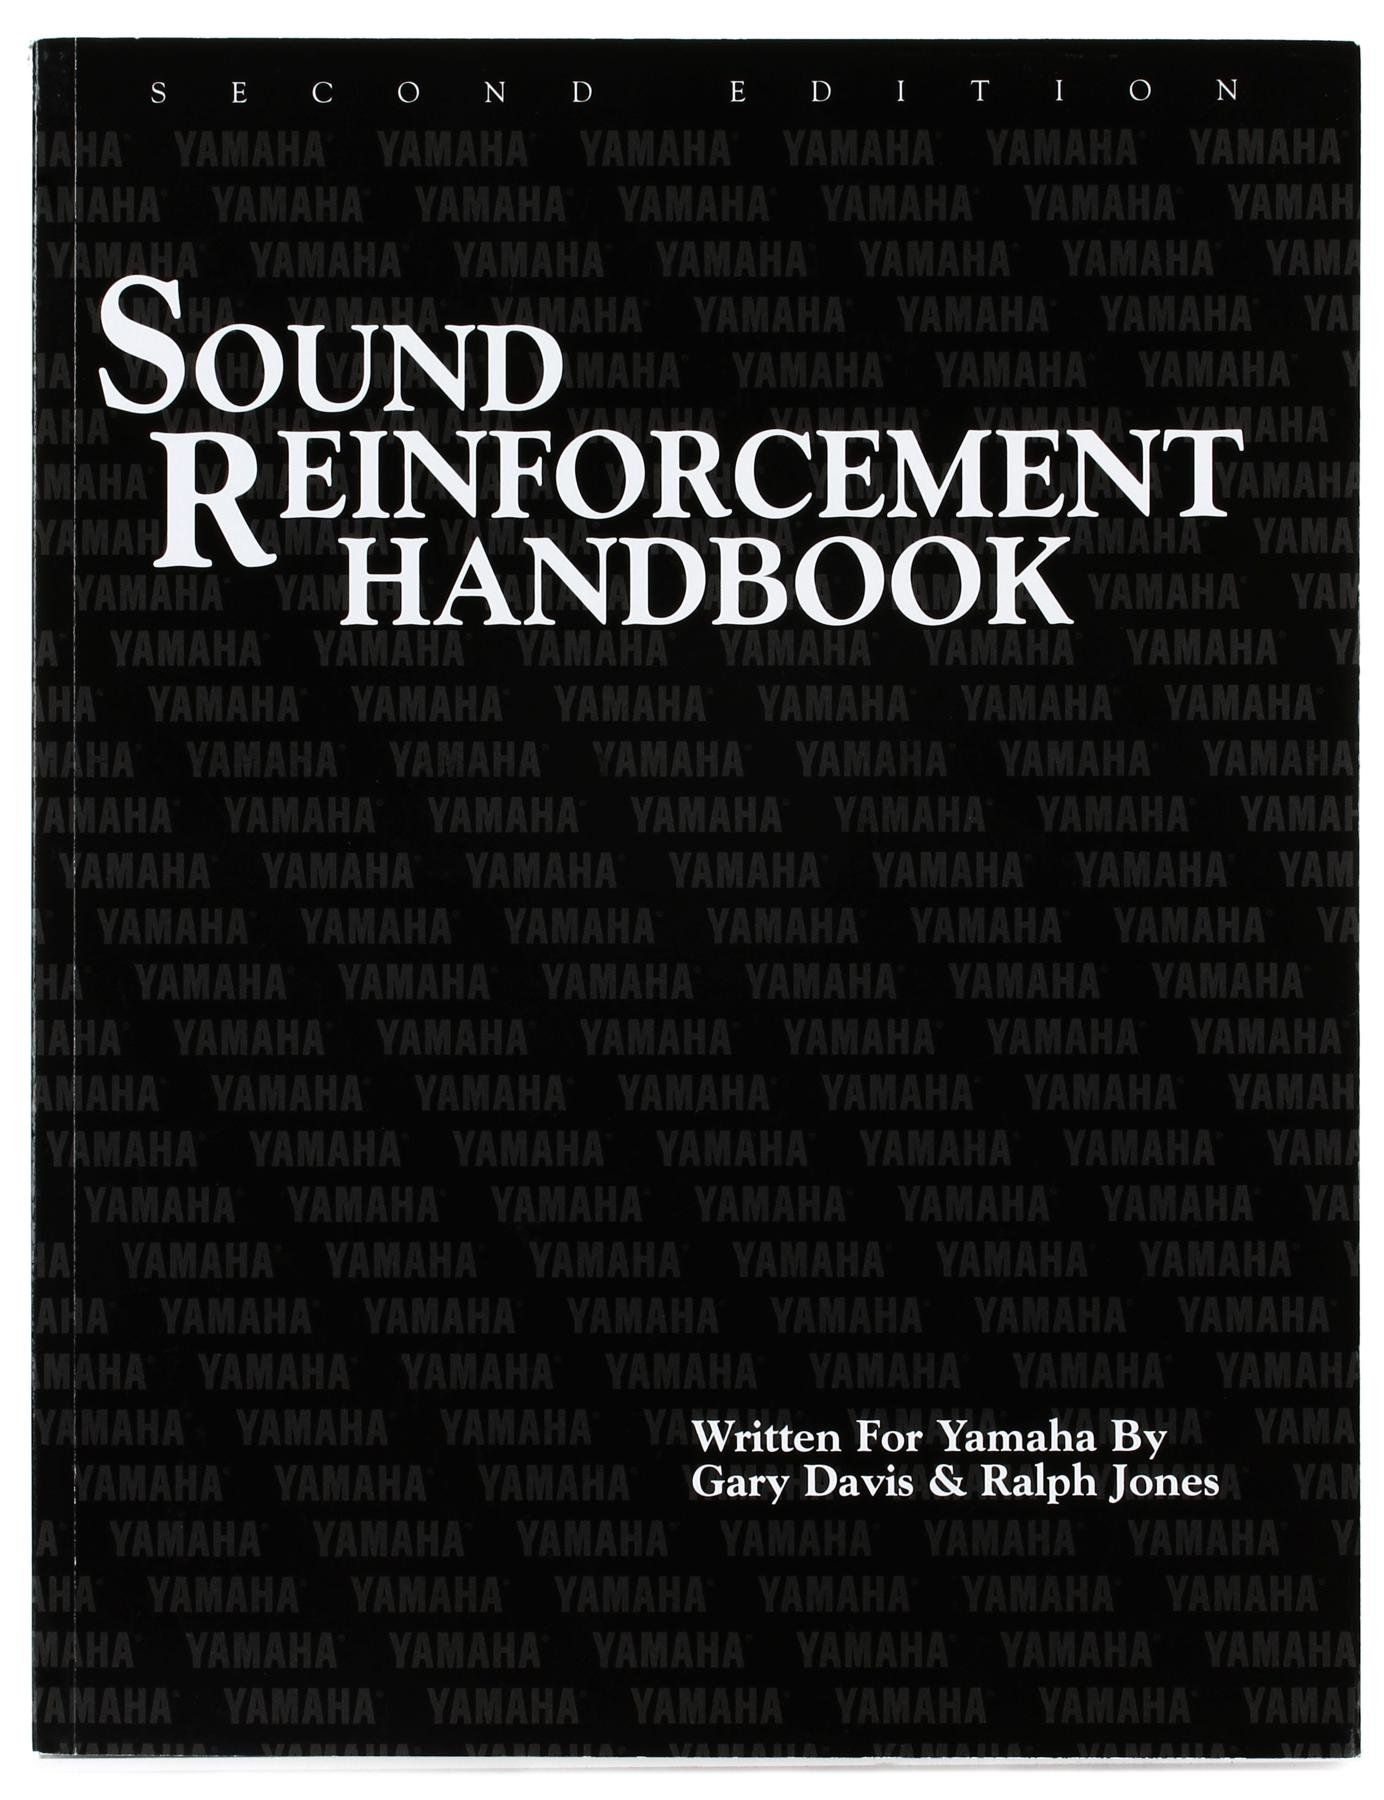 Yamaha Sound Reinforcement Handbook   Sweetwater